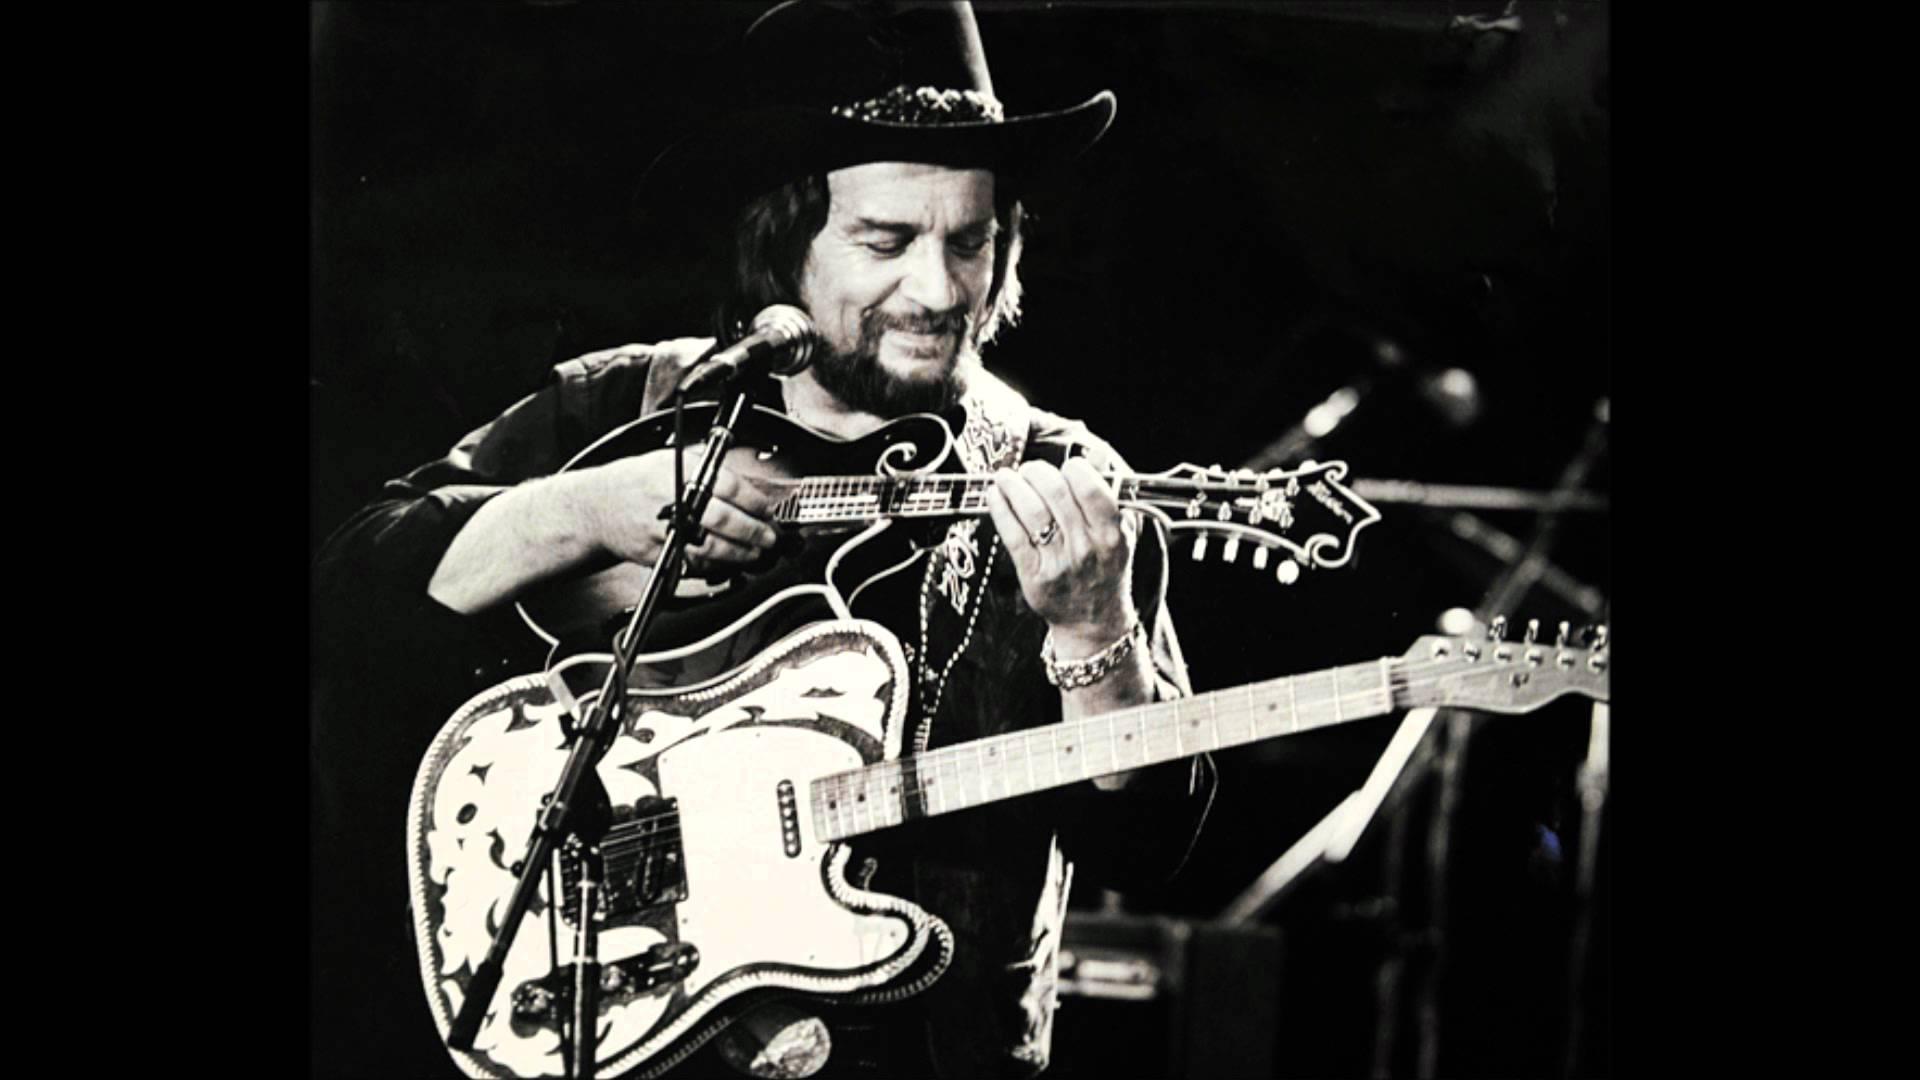 Waylon Jennings Backgrounds on Wallpapers Vista